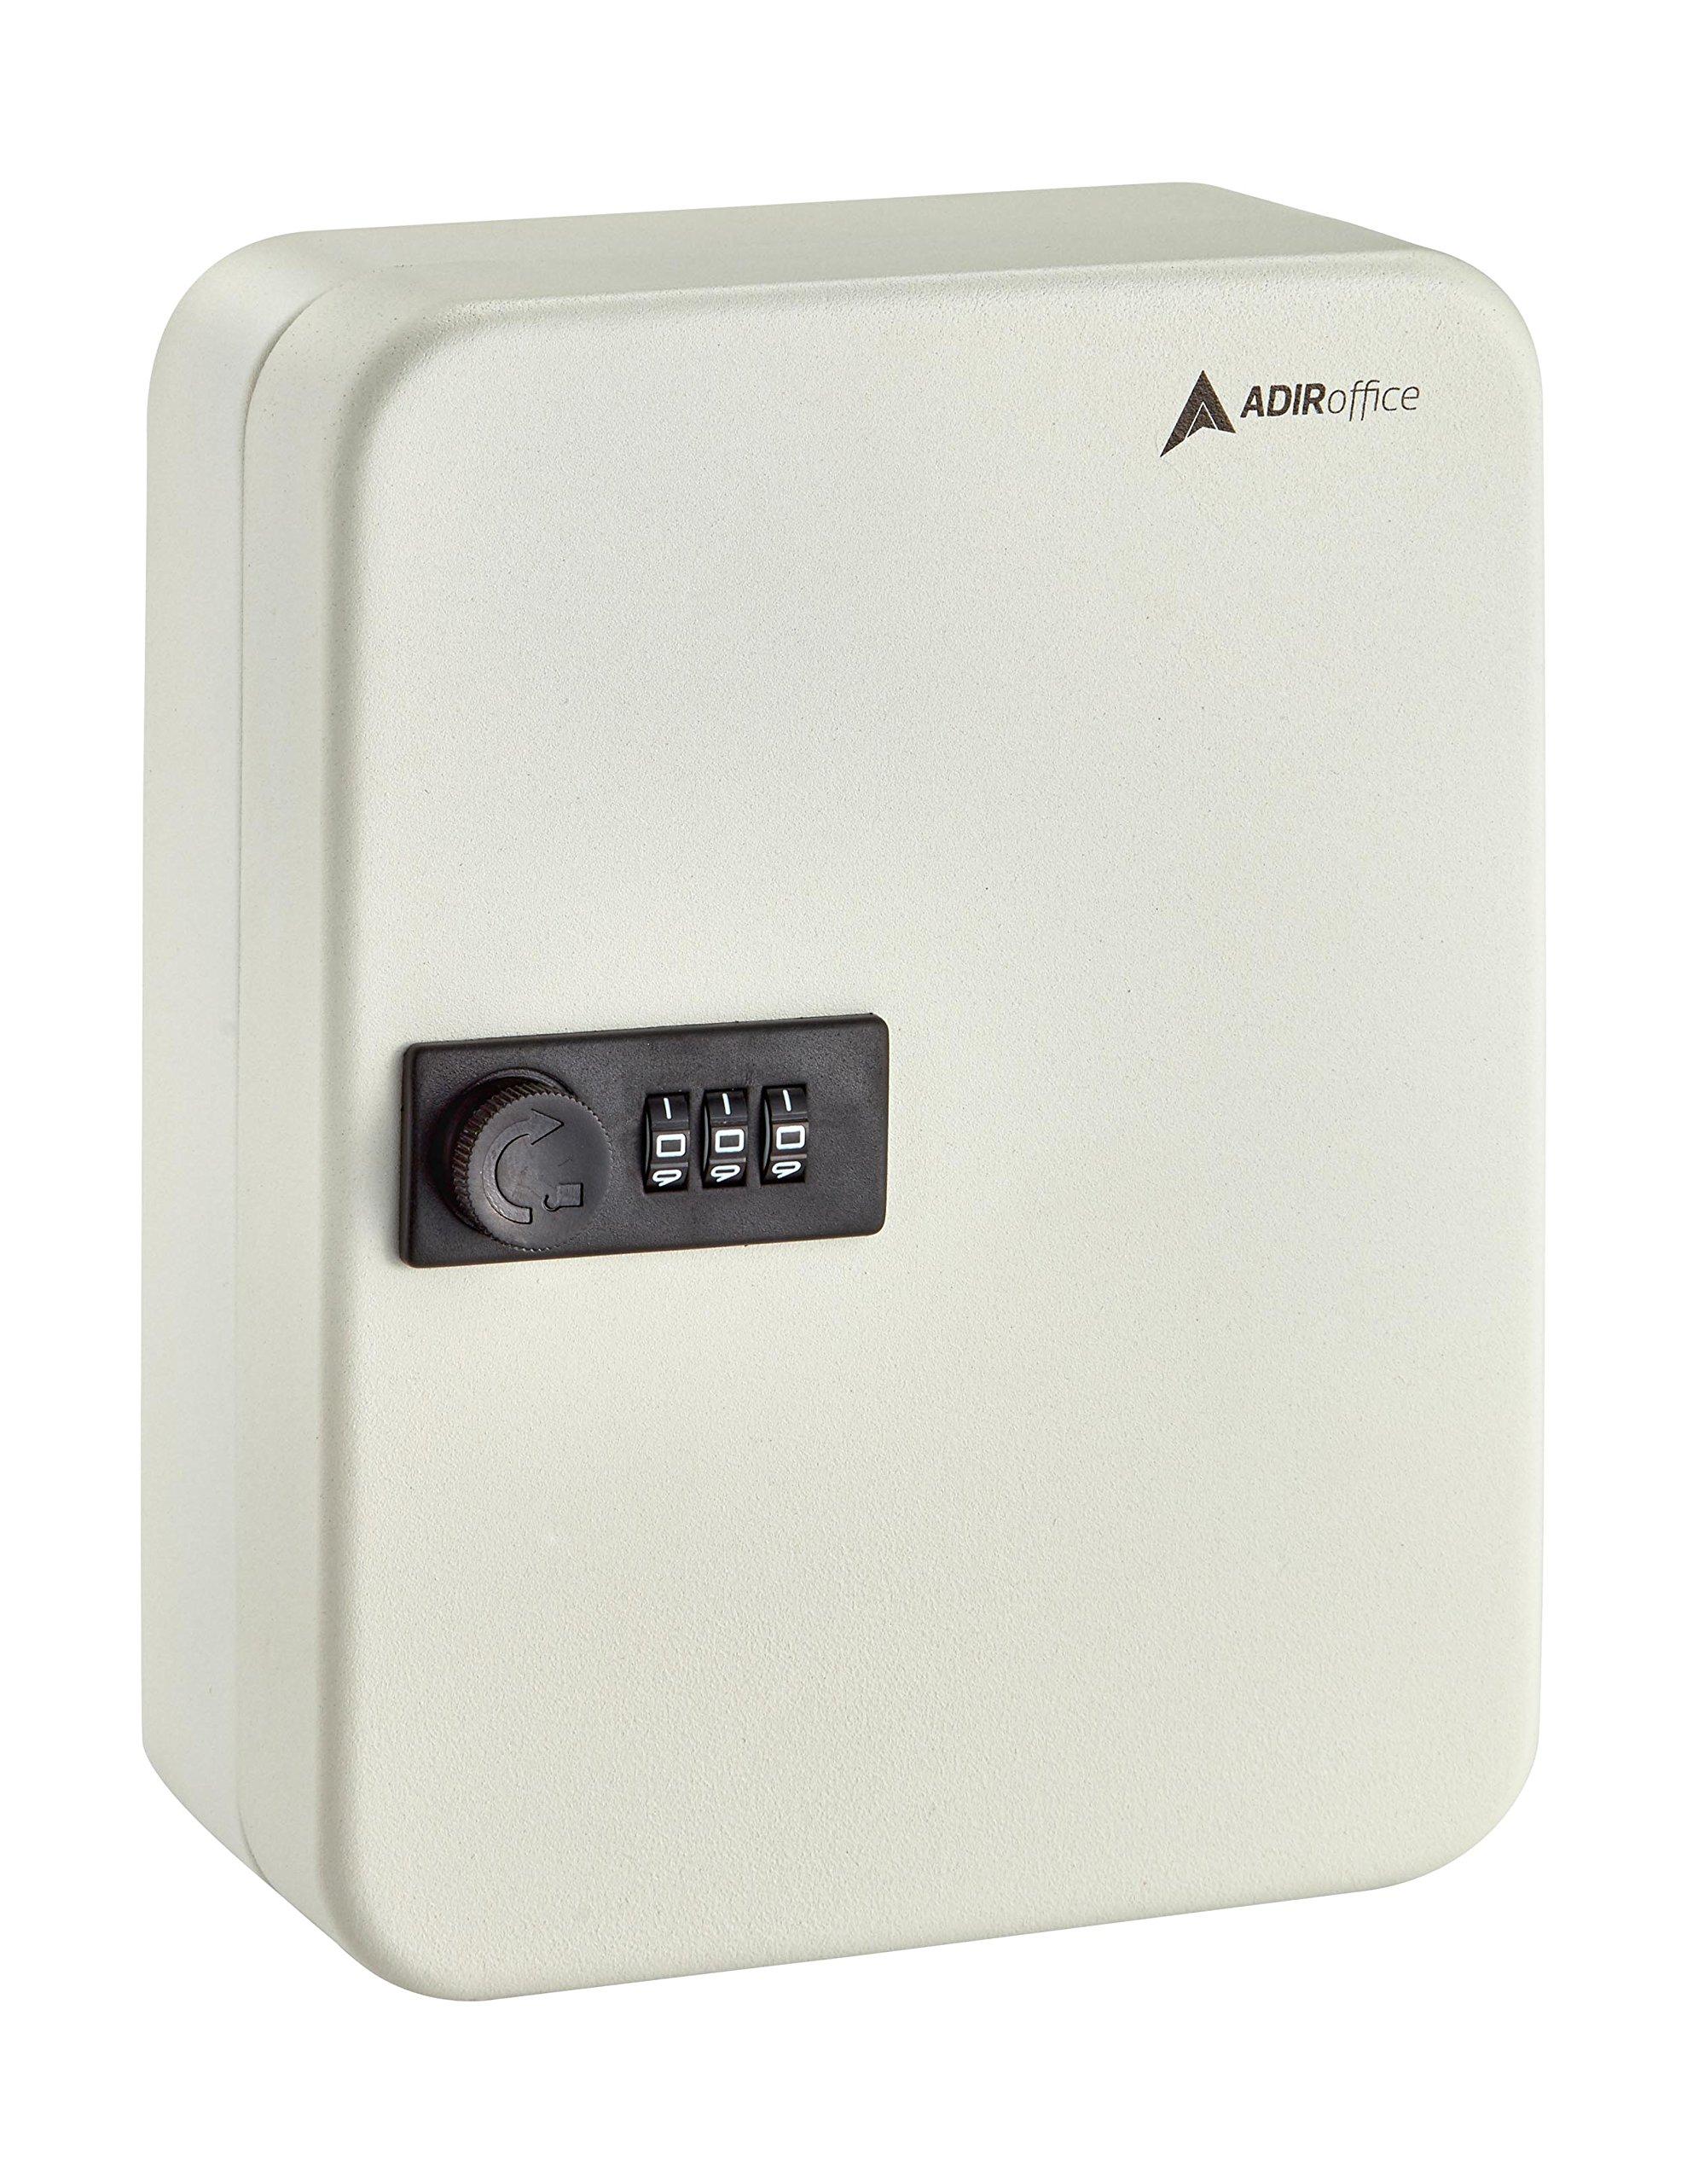 AdirOffice Key Steel Security Cabinet Box, 30 Keys, Combination Lock - White